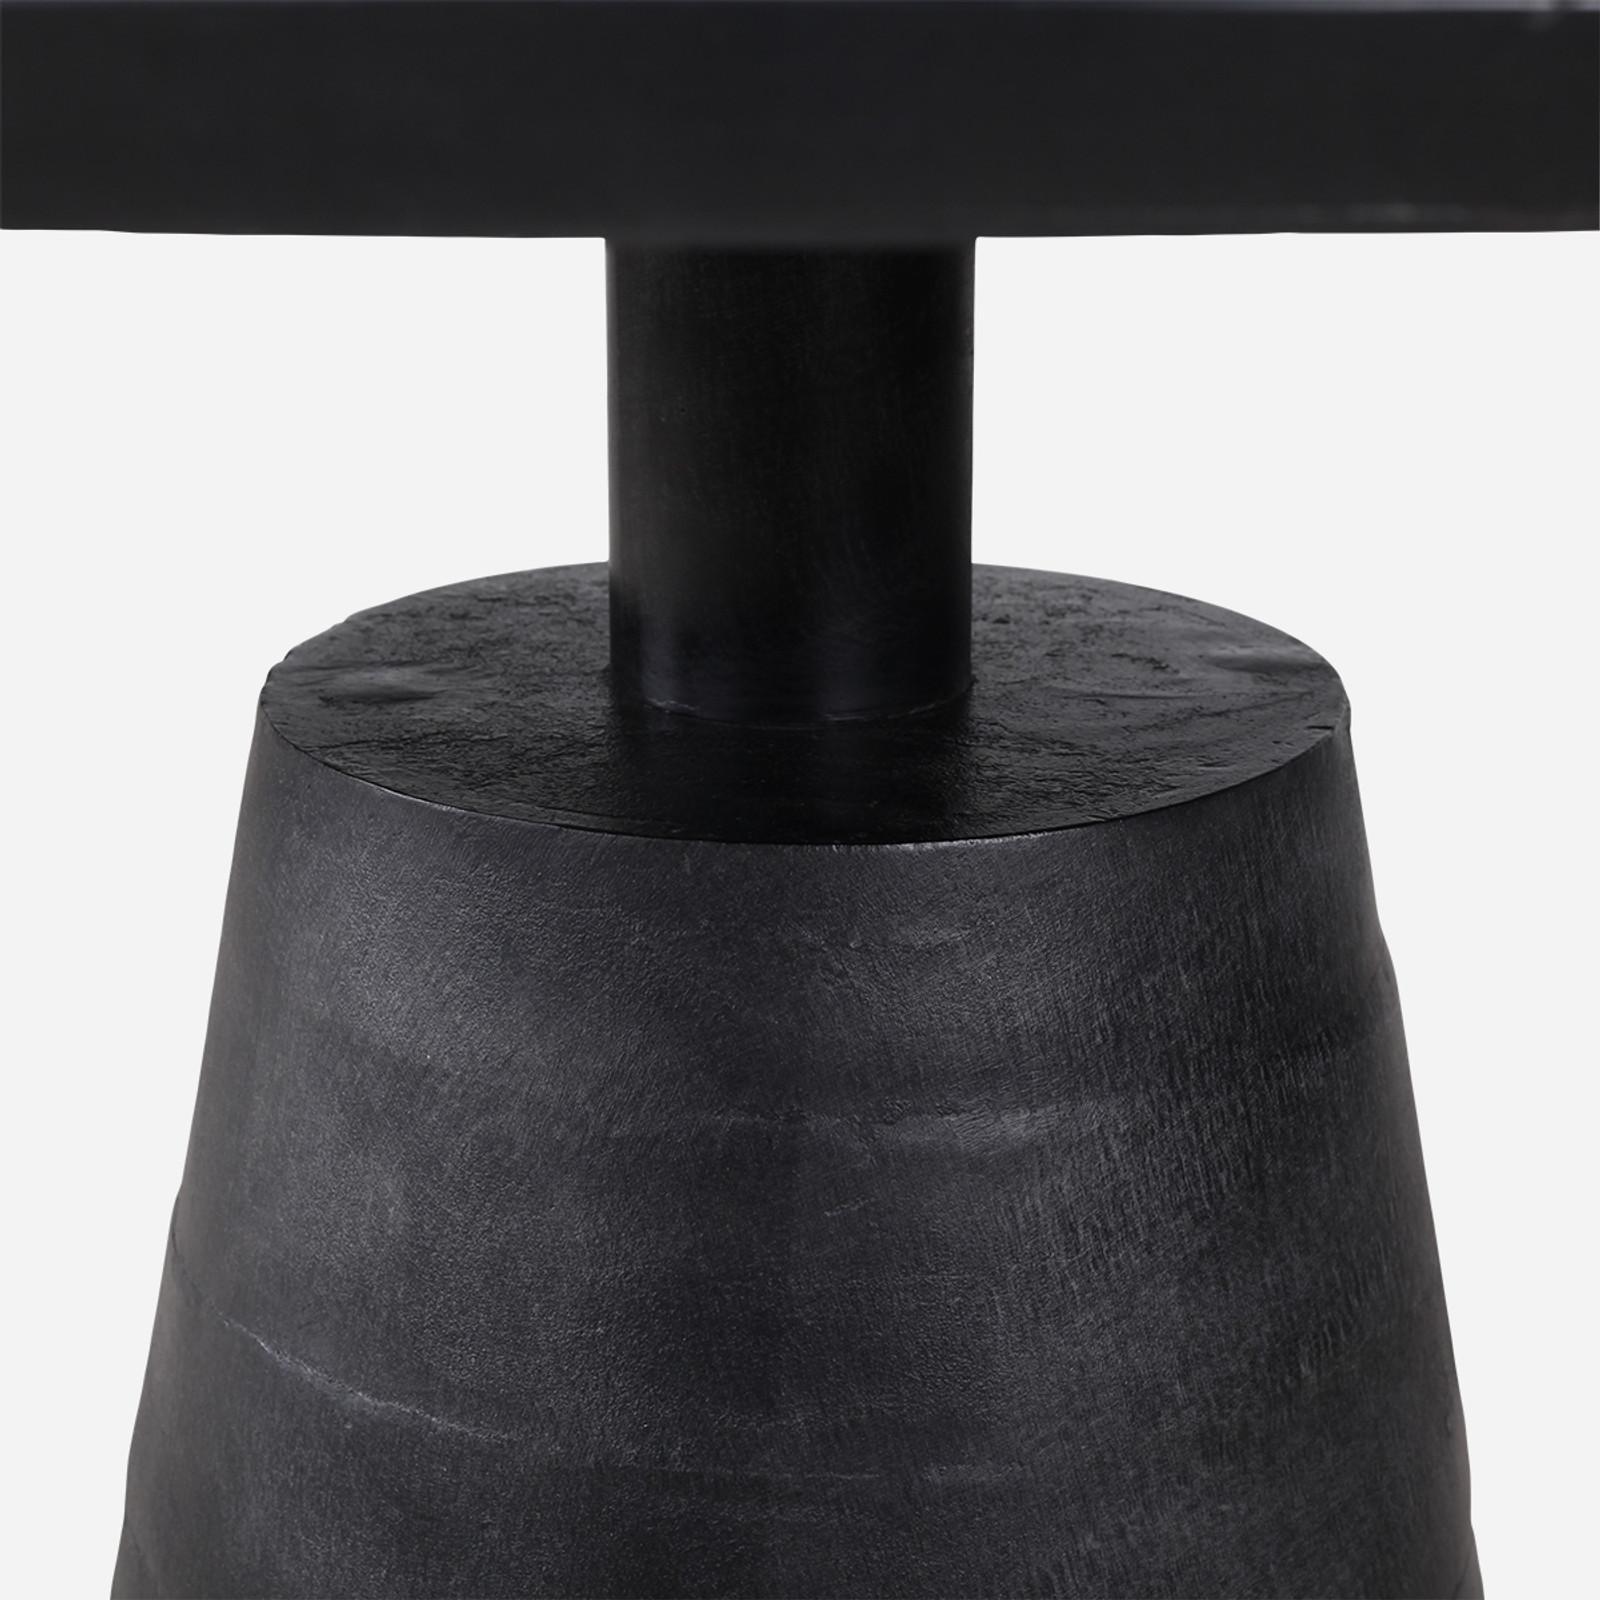 Black Scupper Table, 48in